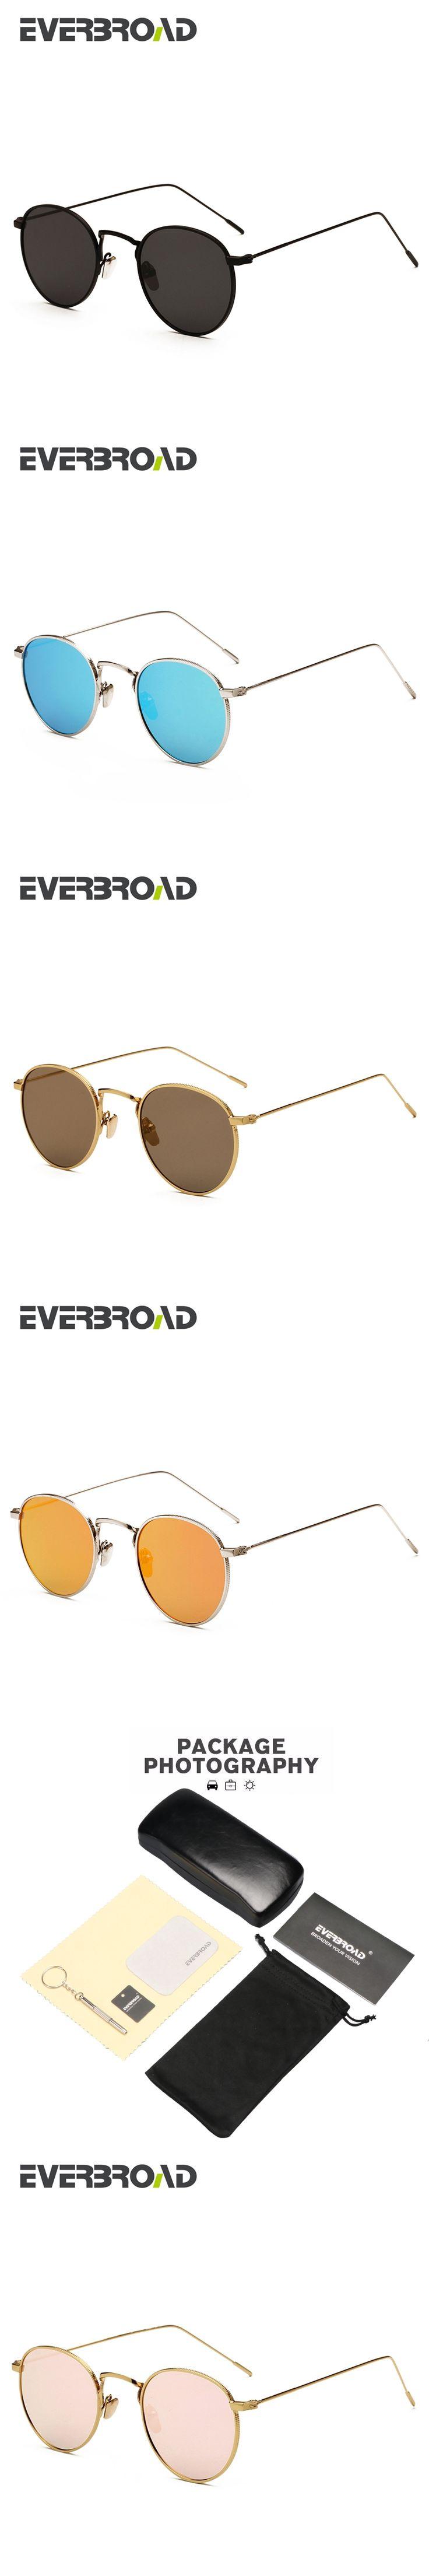 latest fashion full acetate sun glasses women men sunglasses EV2788